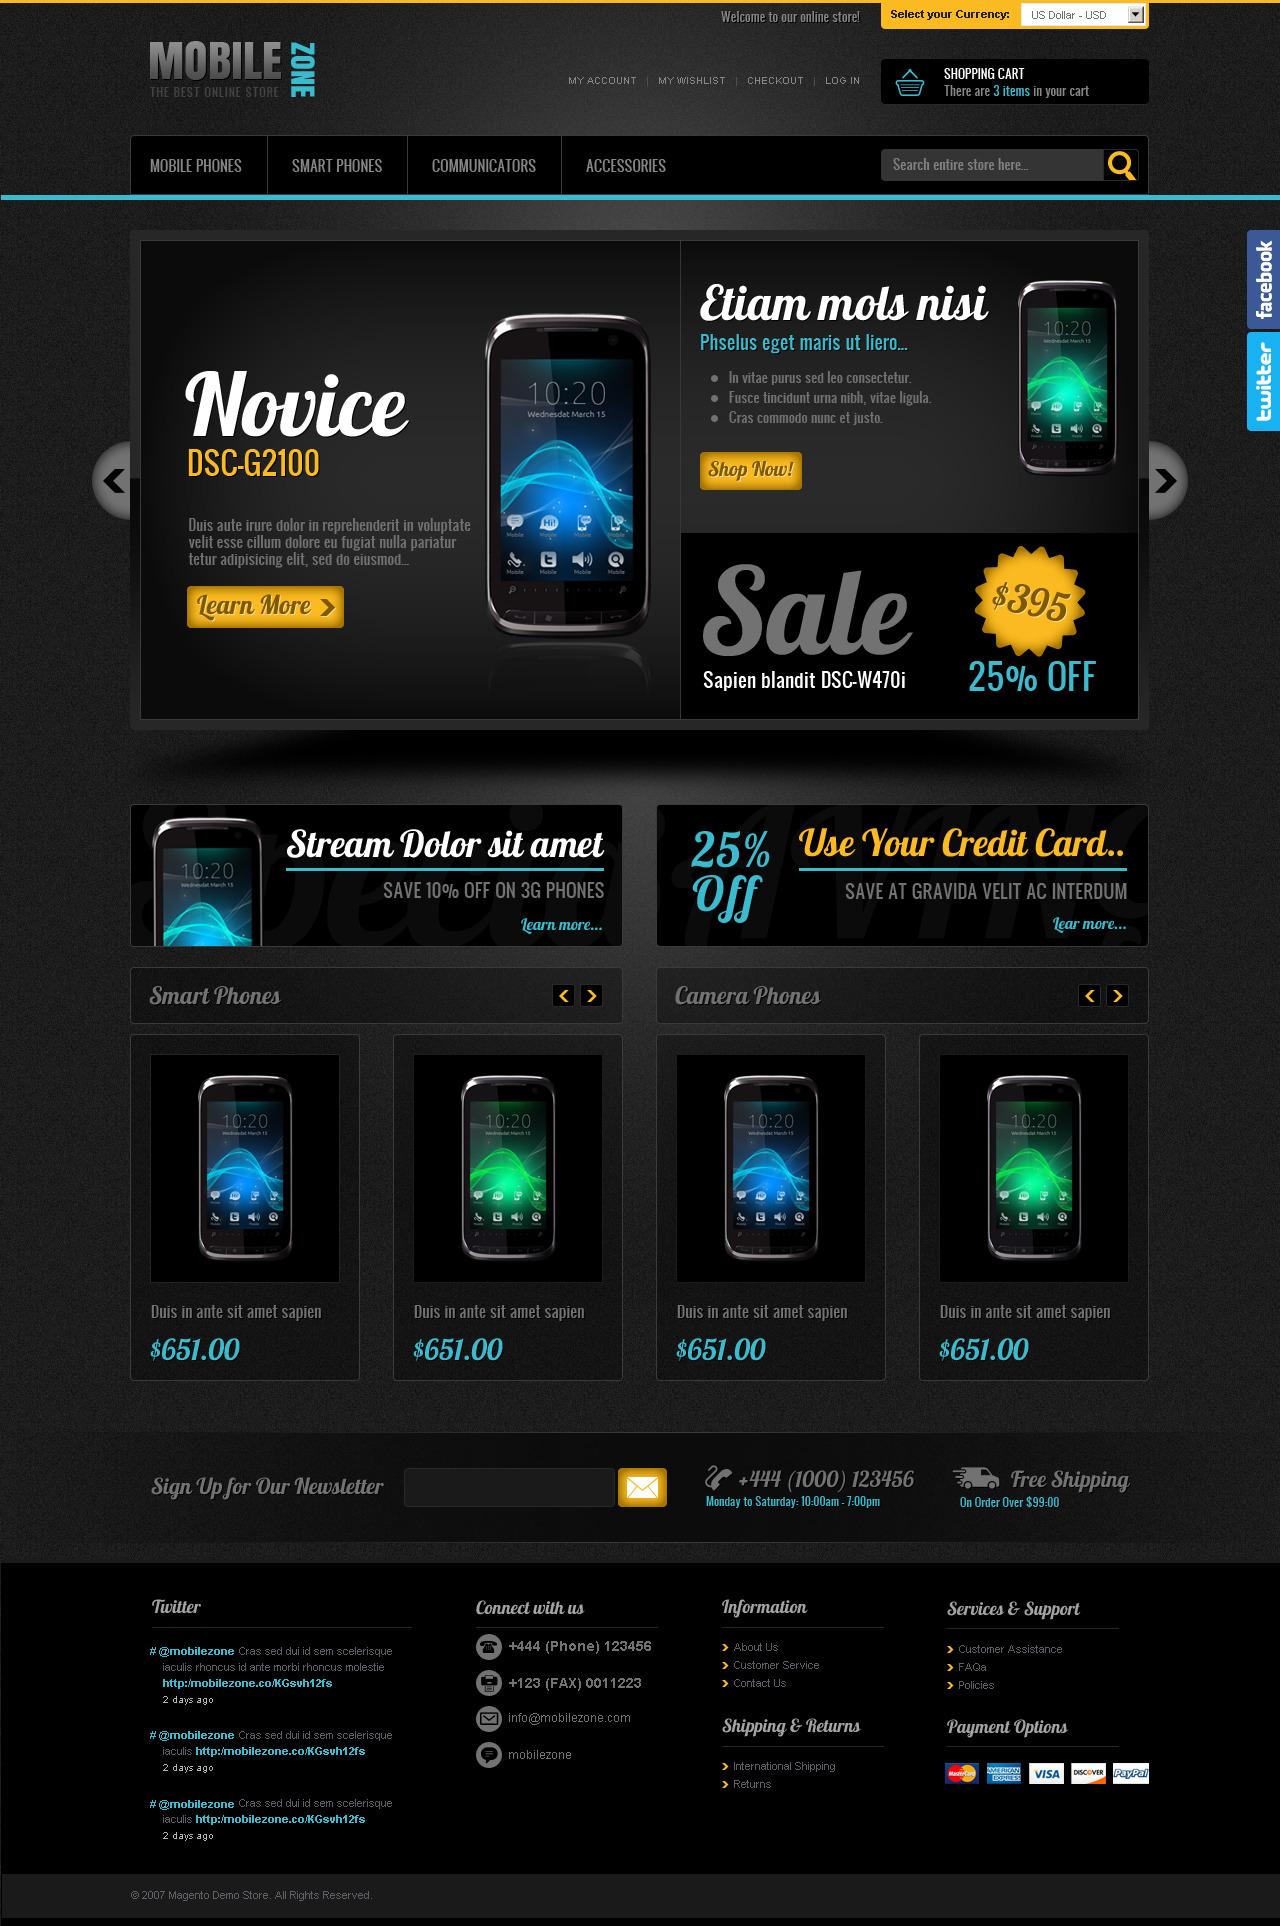 http://0.s3.envato.com/files/22963325/Preview/dark-night/01_home.jpg